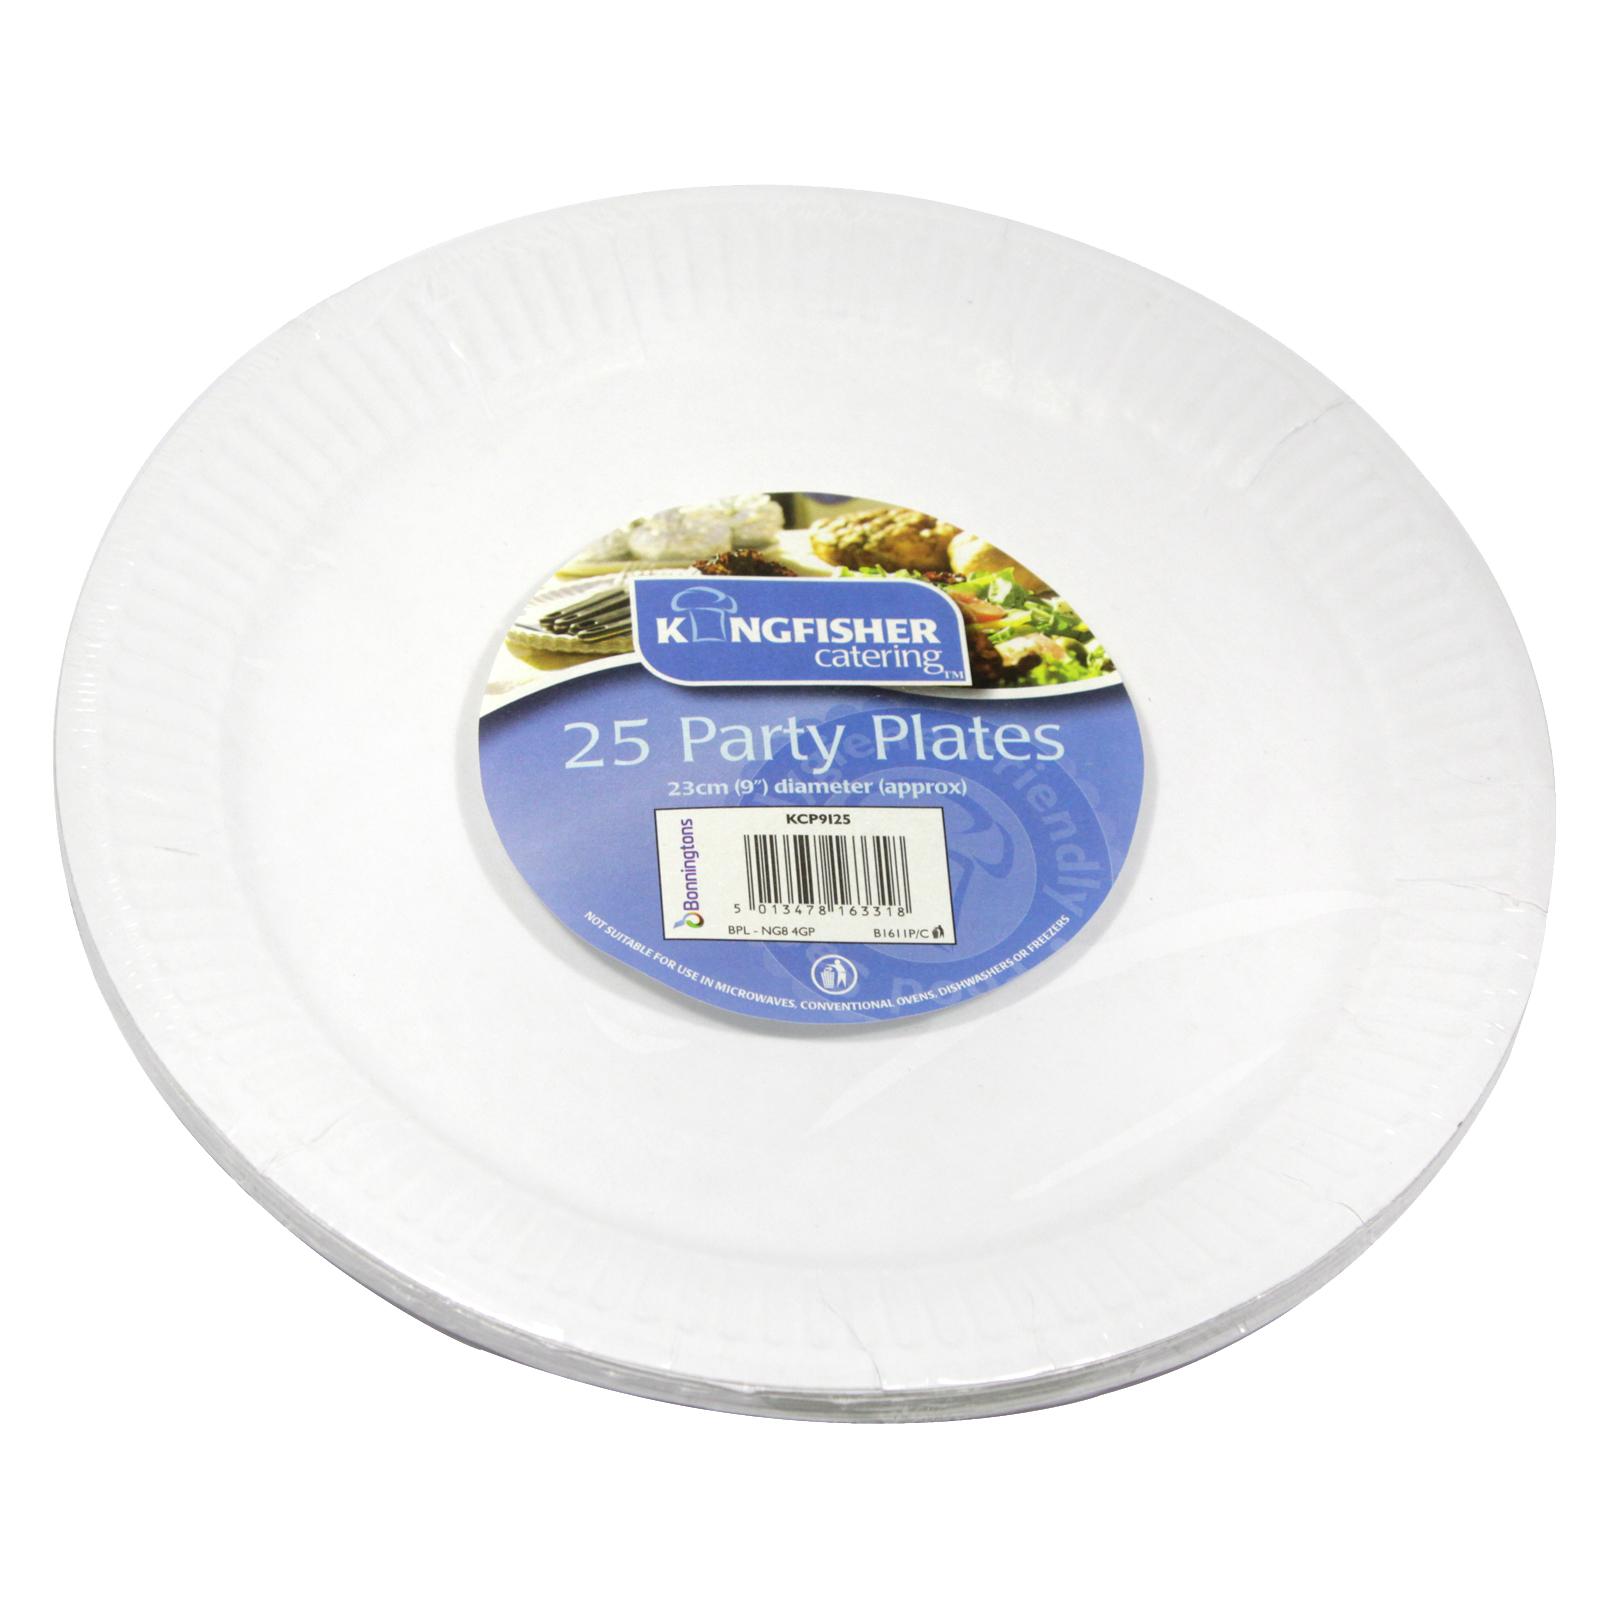 KINGFISHER 25X9 PAPER PLATES WHITE